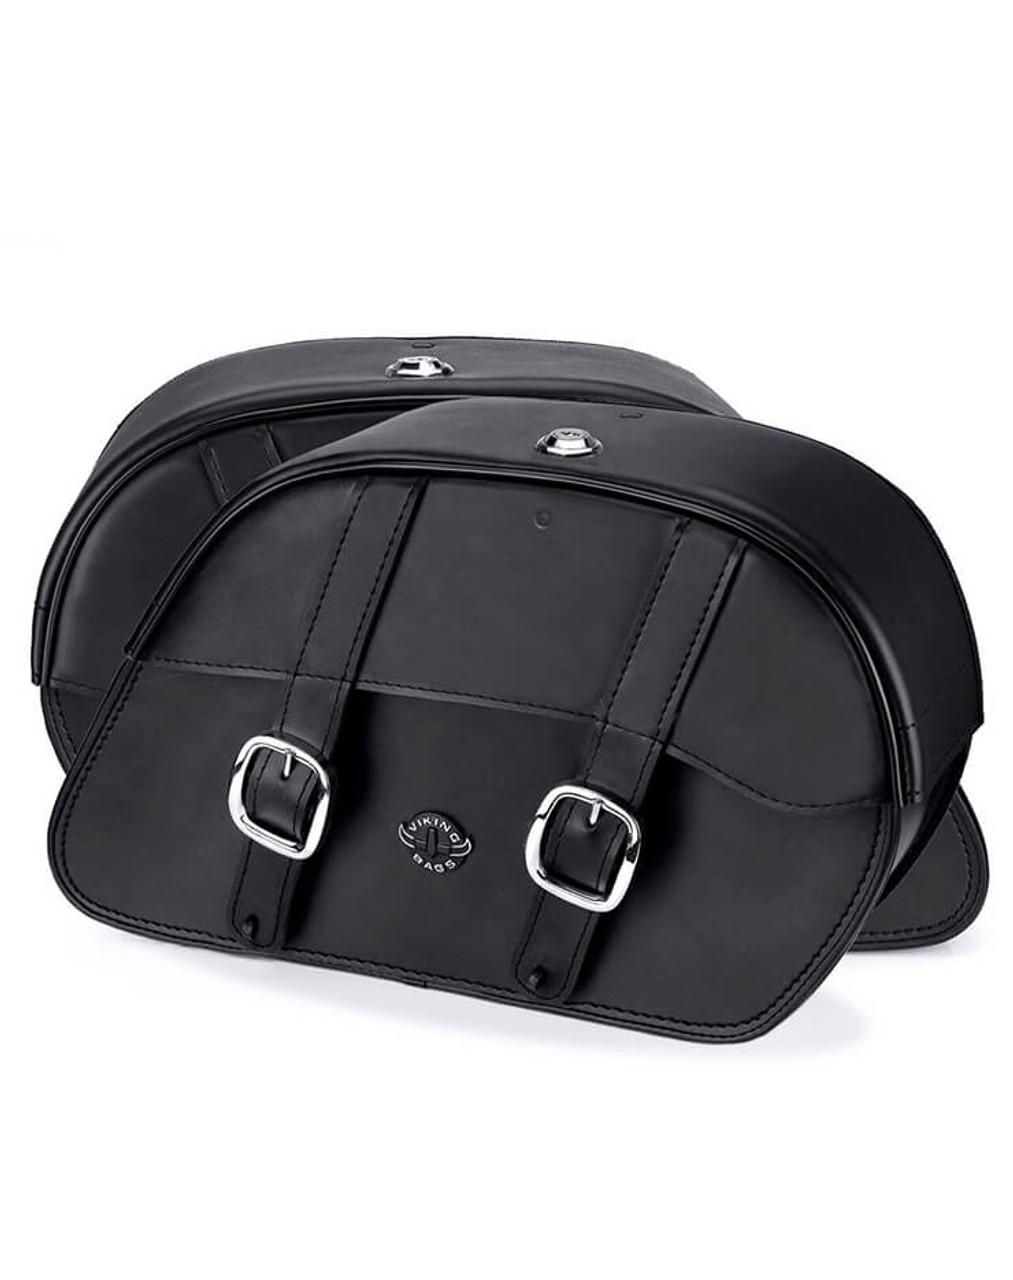 Suzuki Intruder 1500 VL1500 Charger Slanted Medium Motorcycle Saddlebags Both Bags View